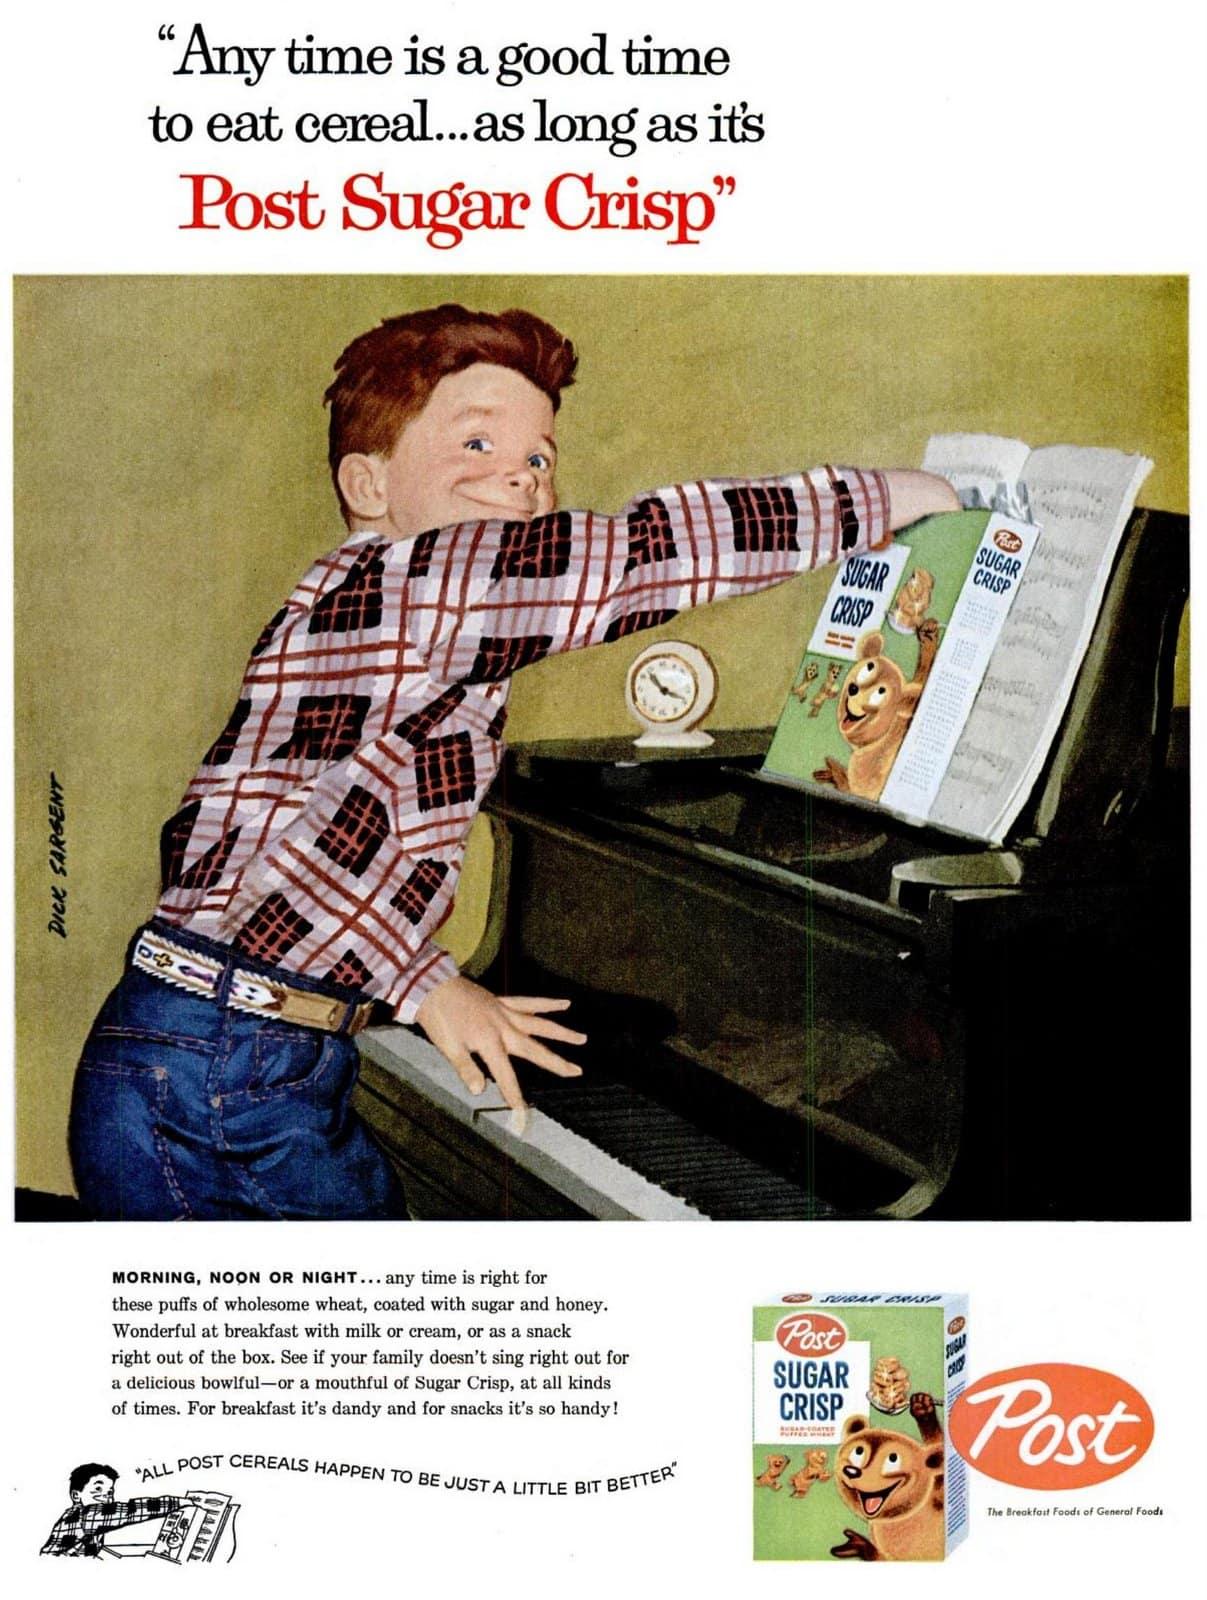 Post Sugar Crisp cereal (1957)